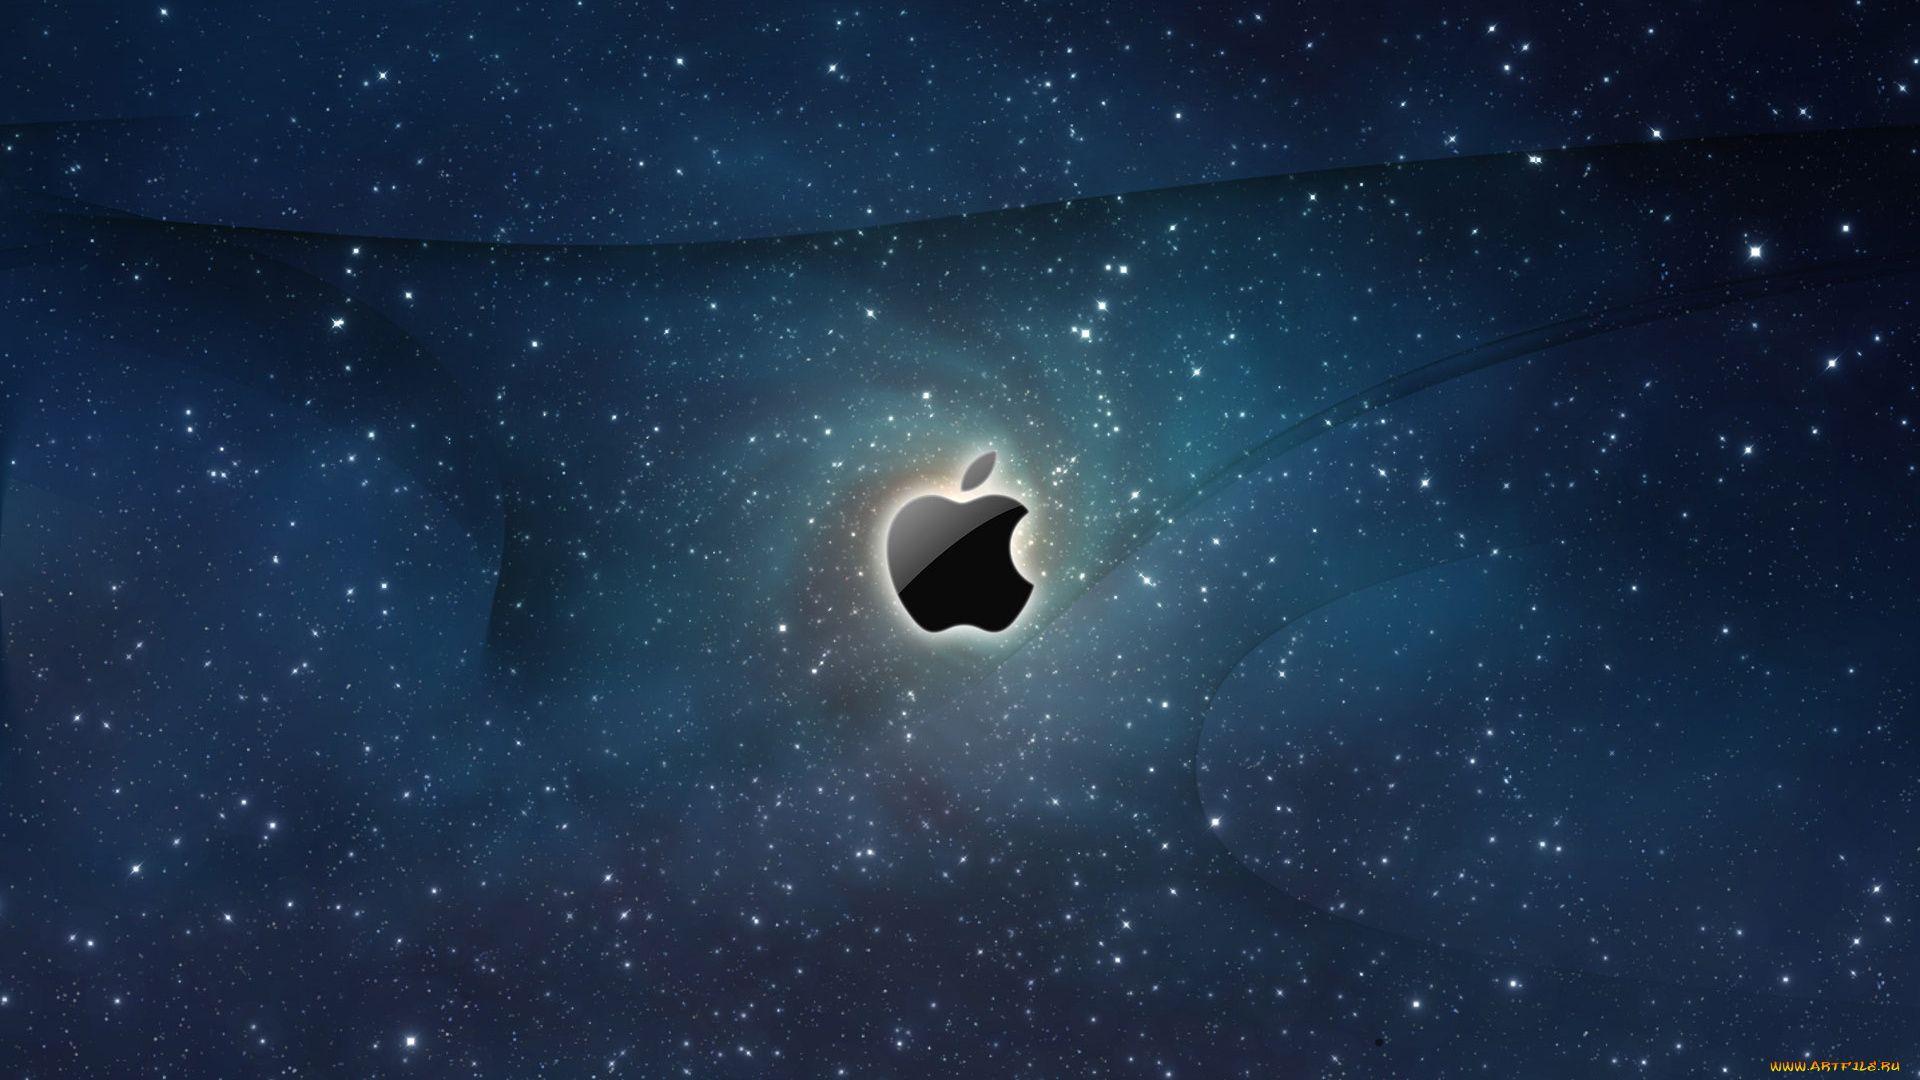 Apple Ipad desktop background